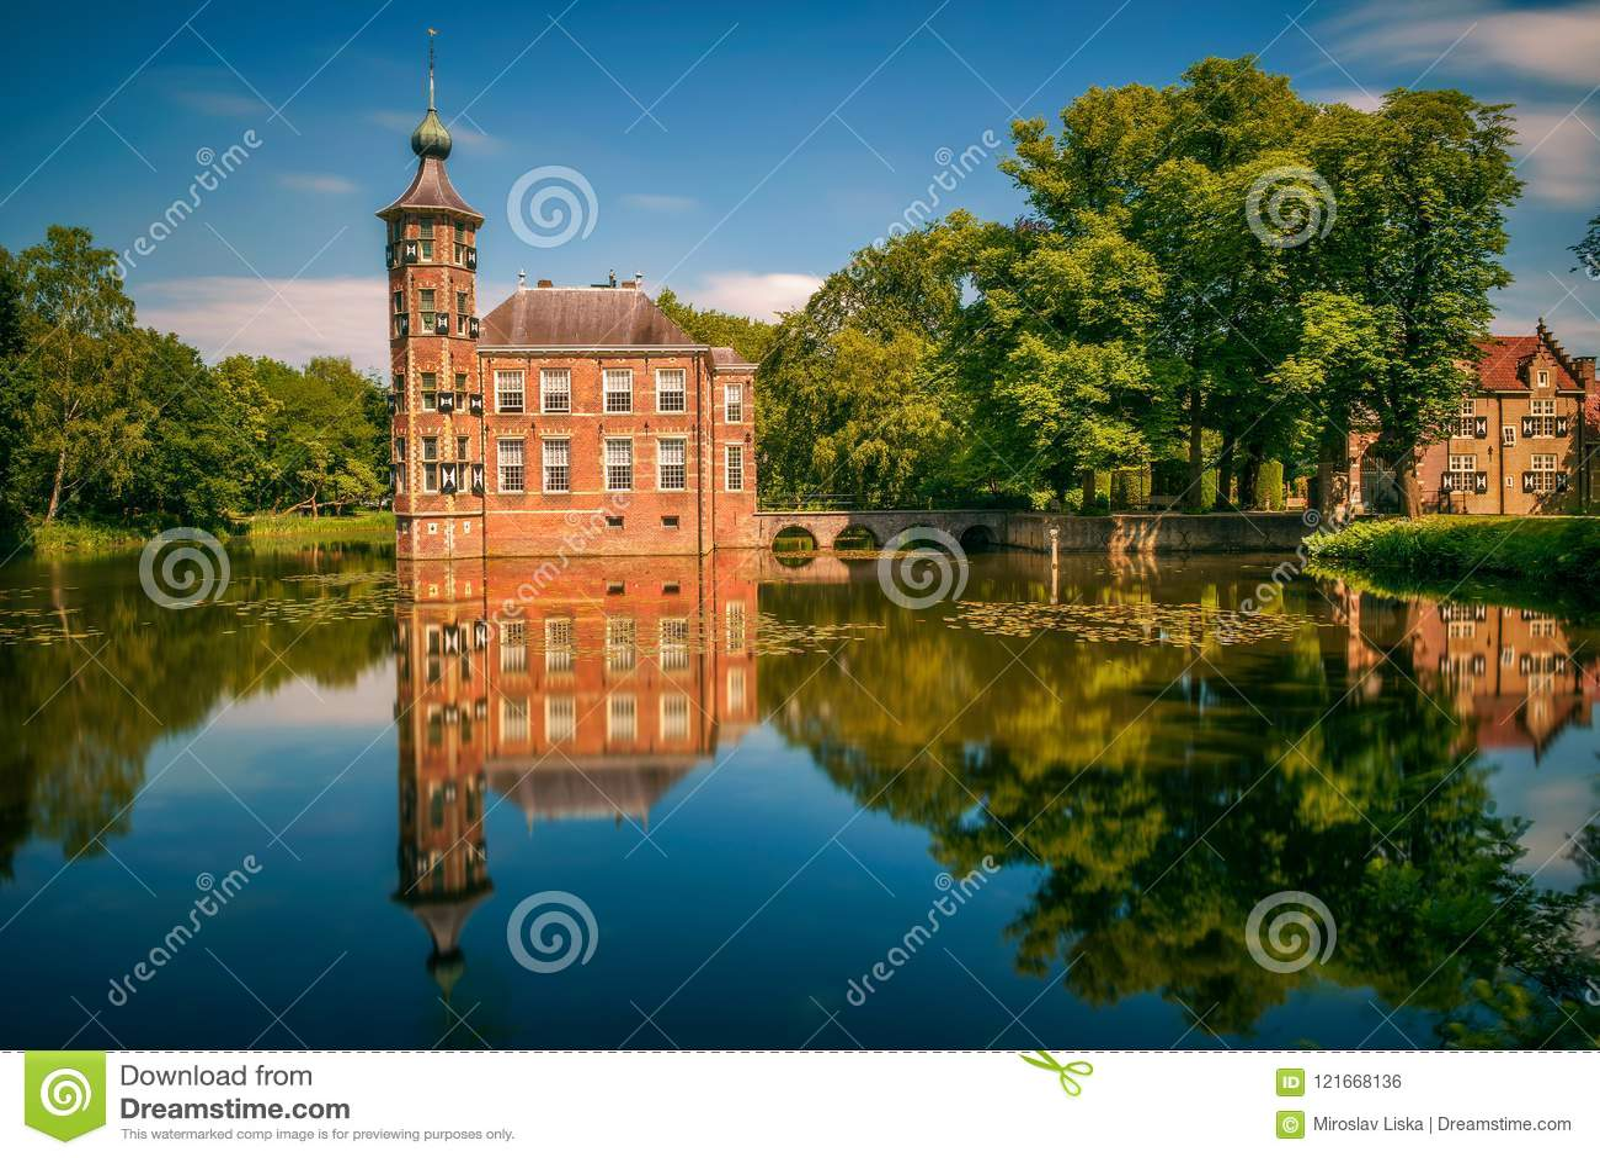 Kasteel Bouvigne en het omringende park in Breda, Nederland